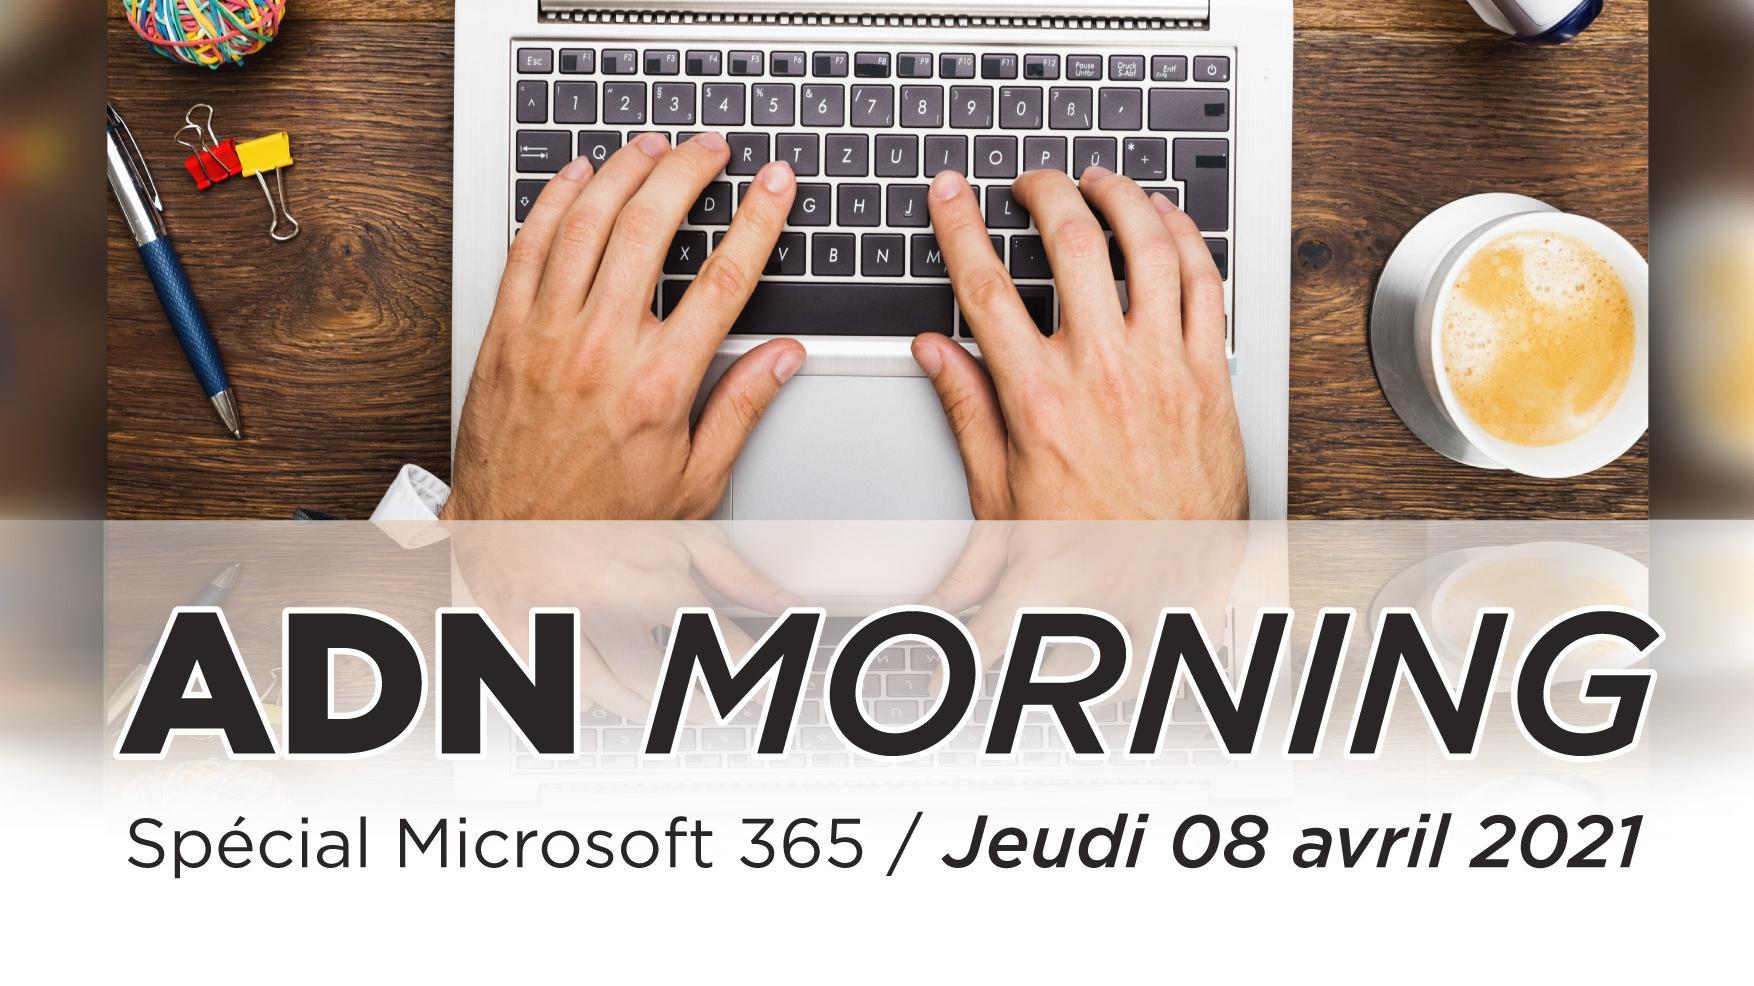 ADN Morning Microsoft 365